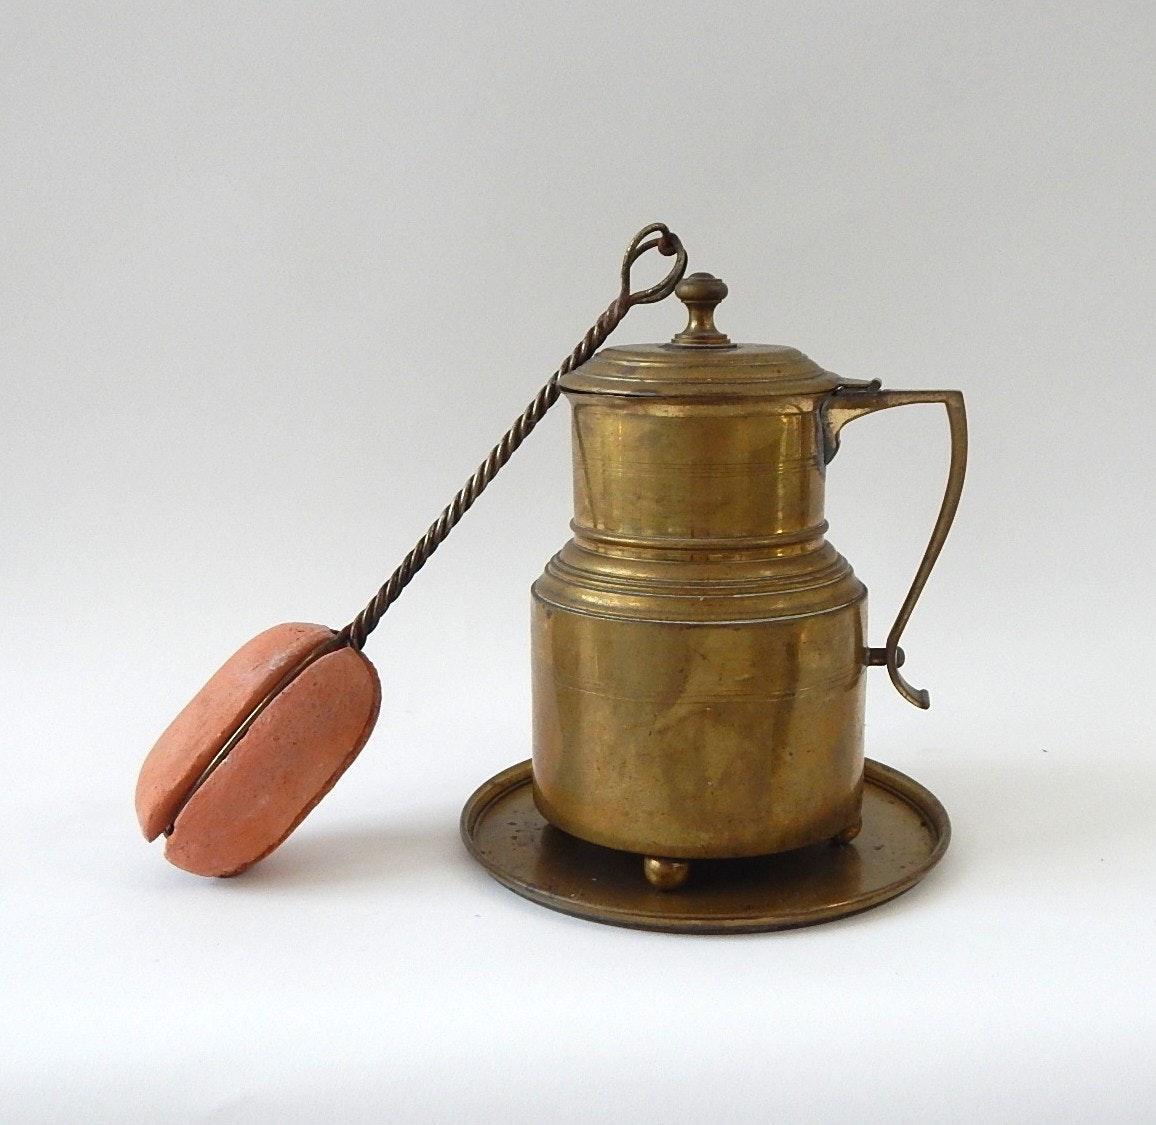 Cape Cod Brass Fire Starter and Plate